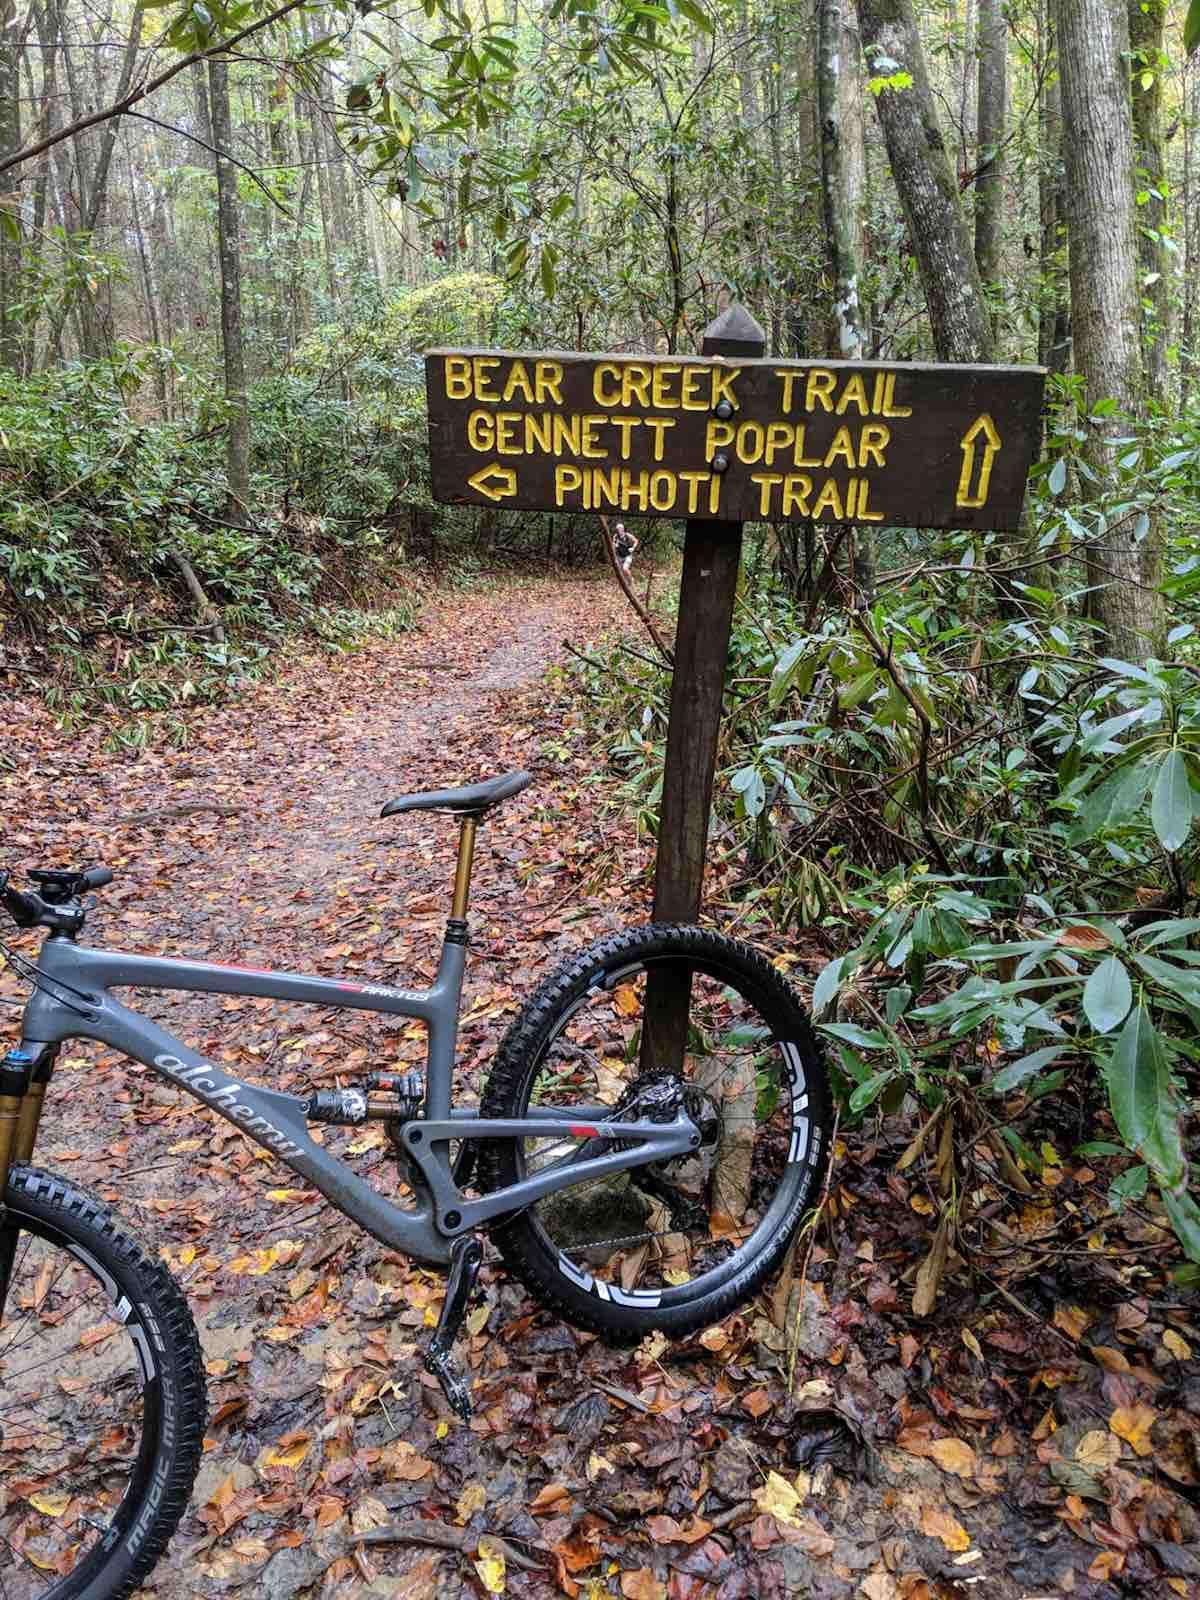 Bikerumor Pic Of The Day: Pinhoti Trail System, Georgia